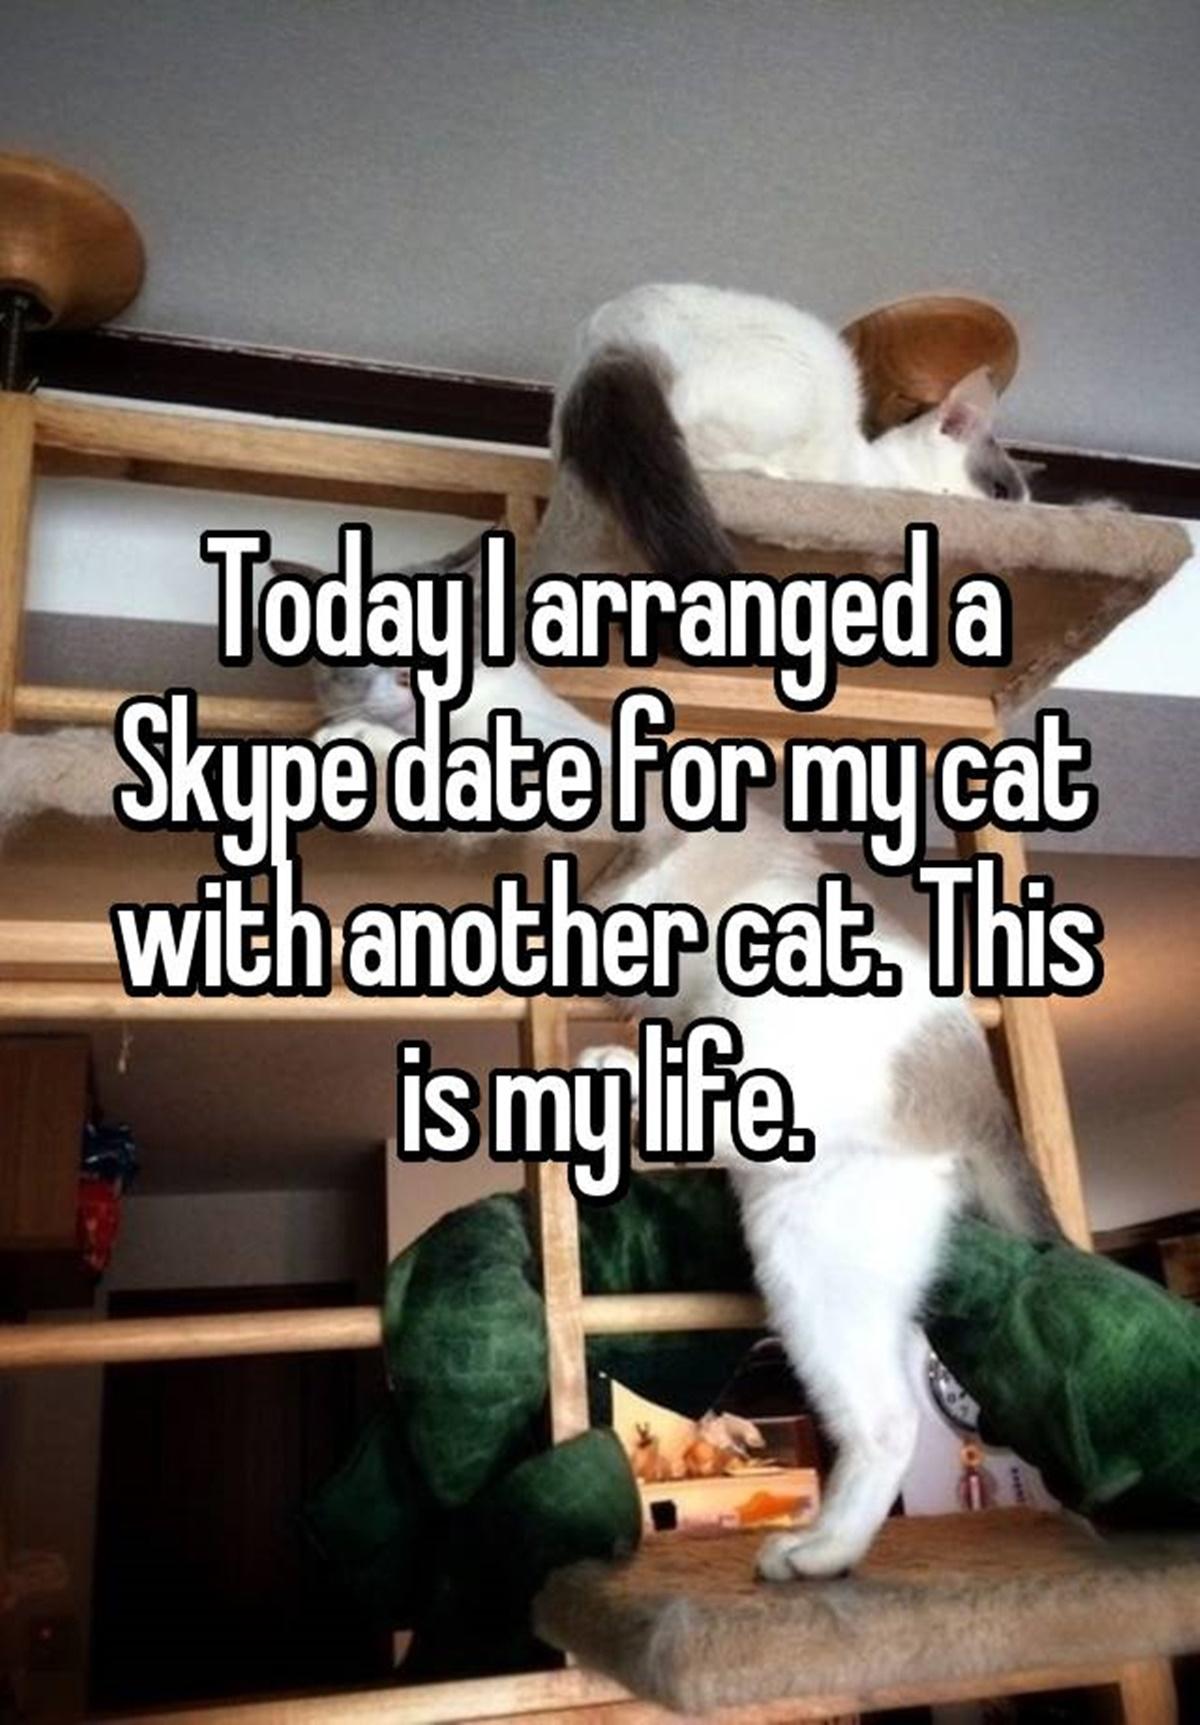 chiamata Skype tra gatti